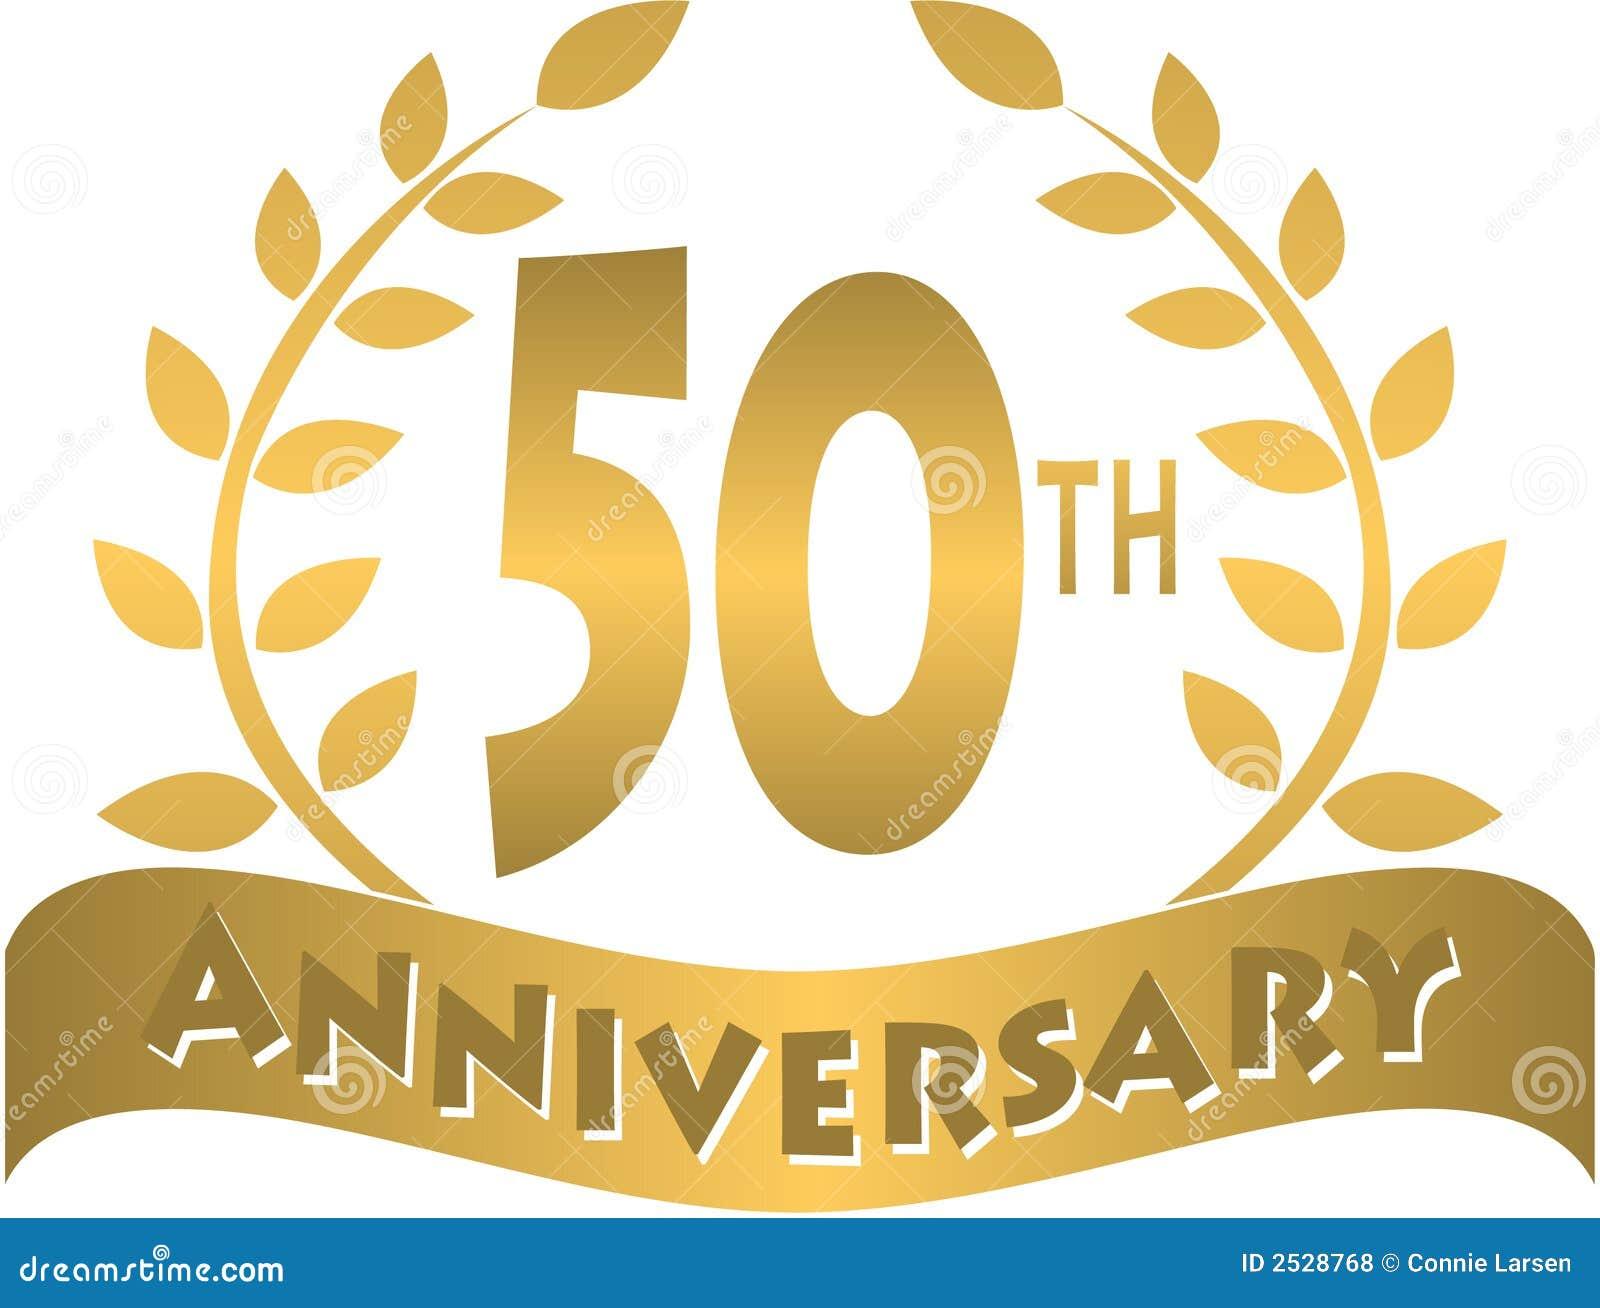 50th Wedding Anniversary Invitations 006 - 50th Wedding Anniversary Invitations